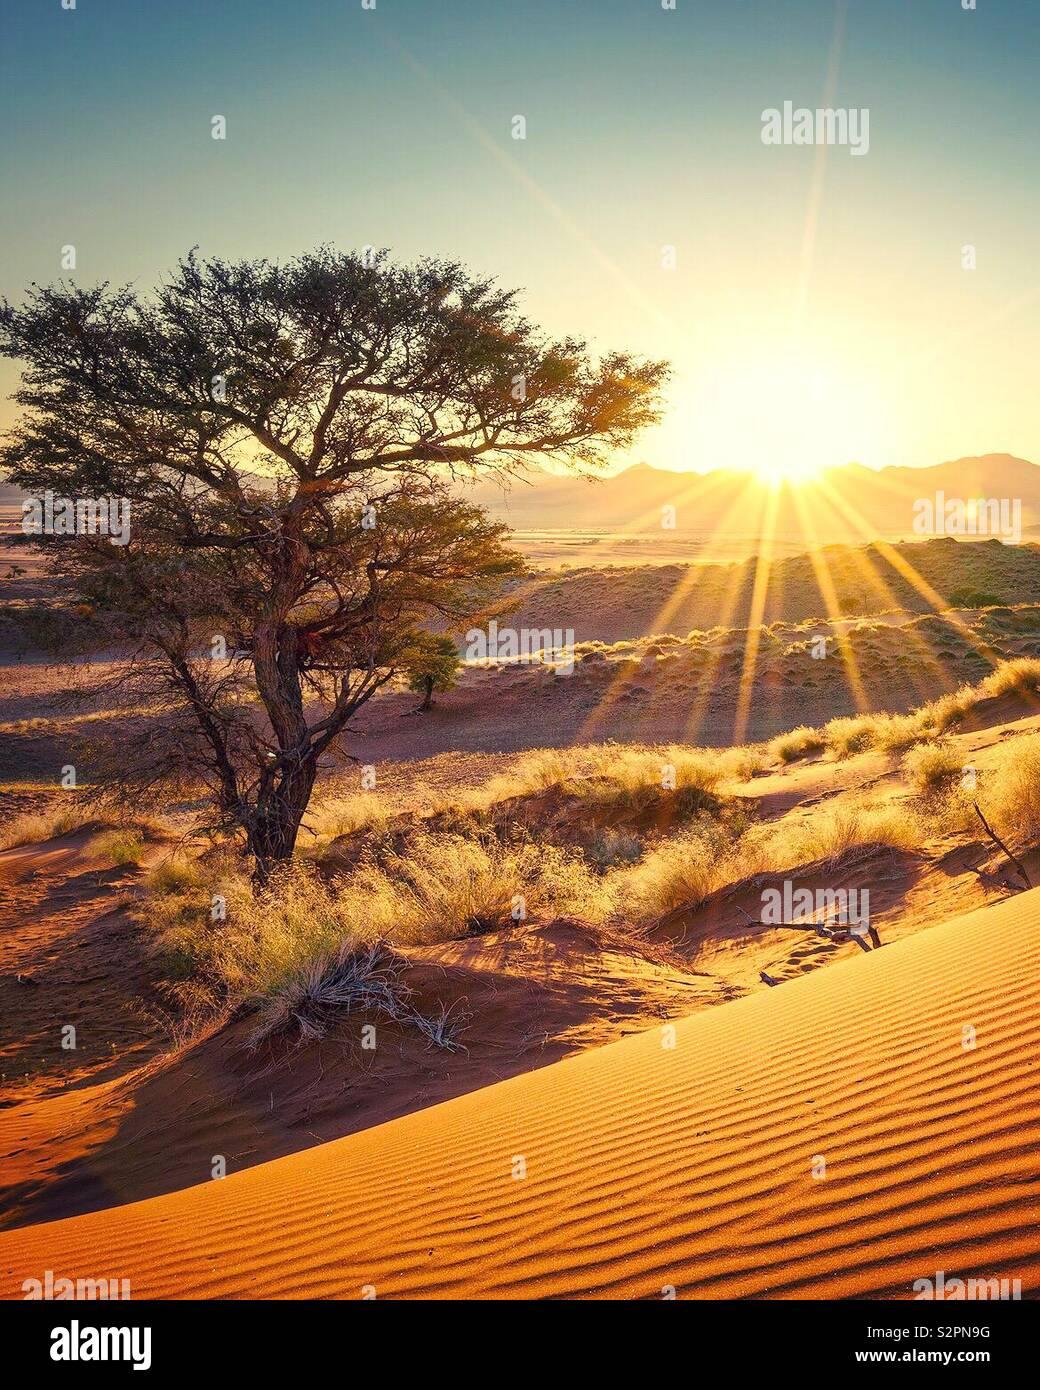 Sun rising on the desert of Namibia Stock Photo